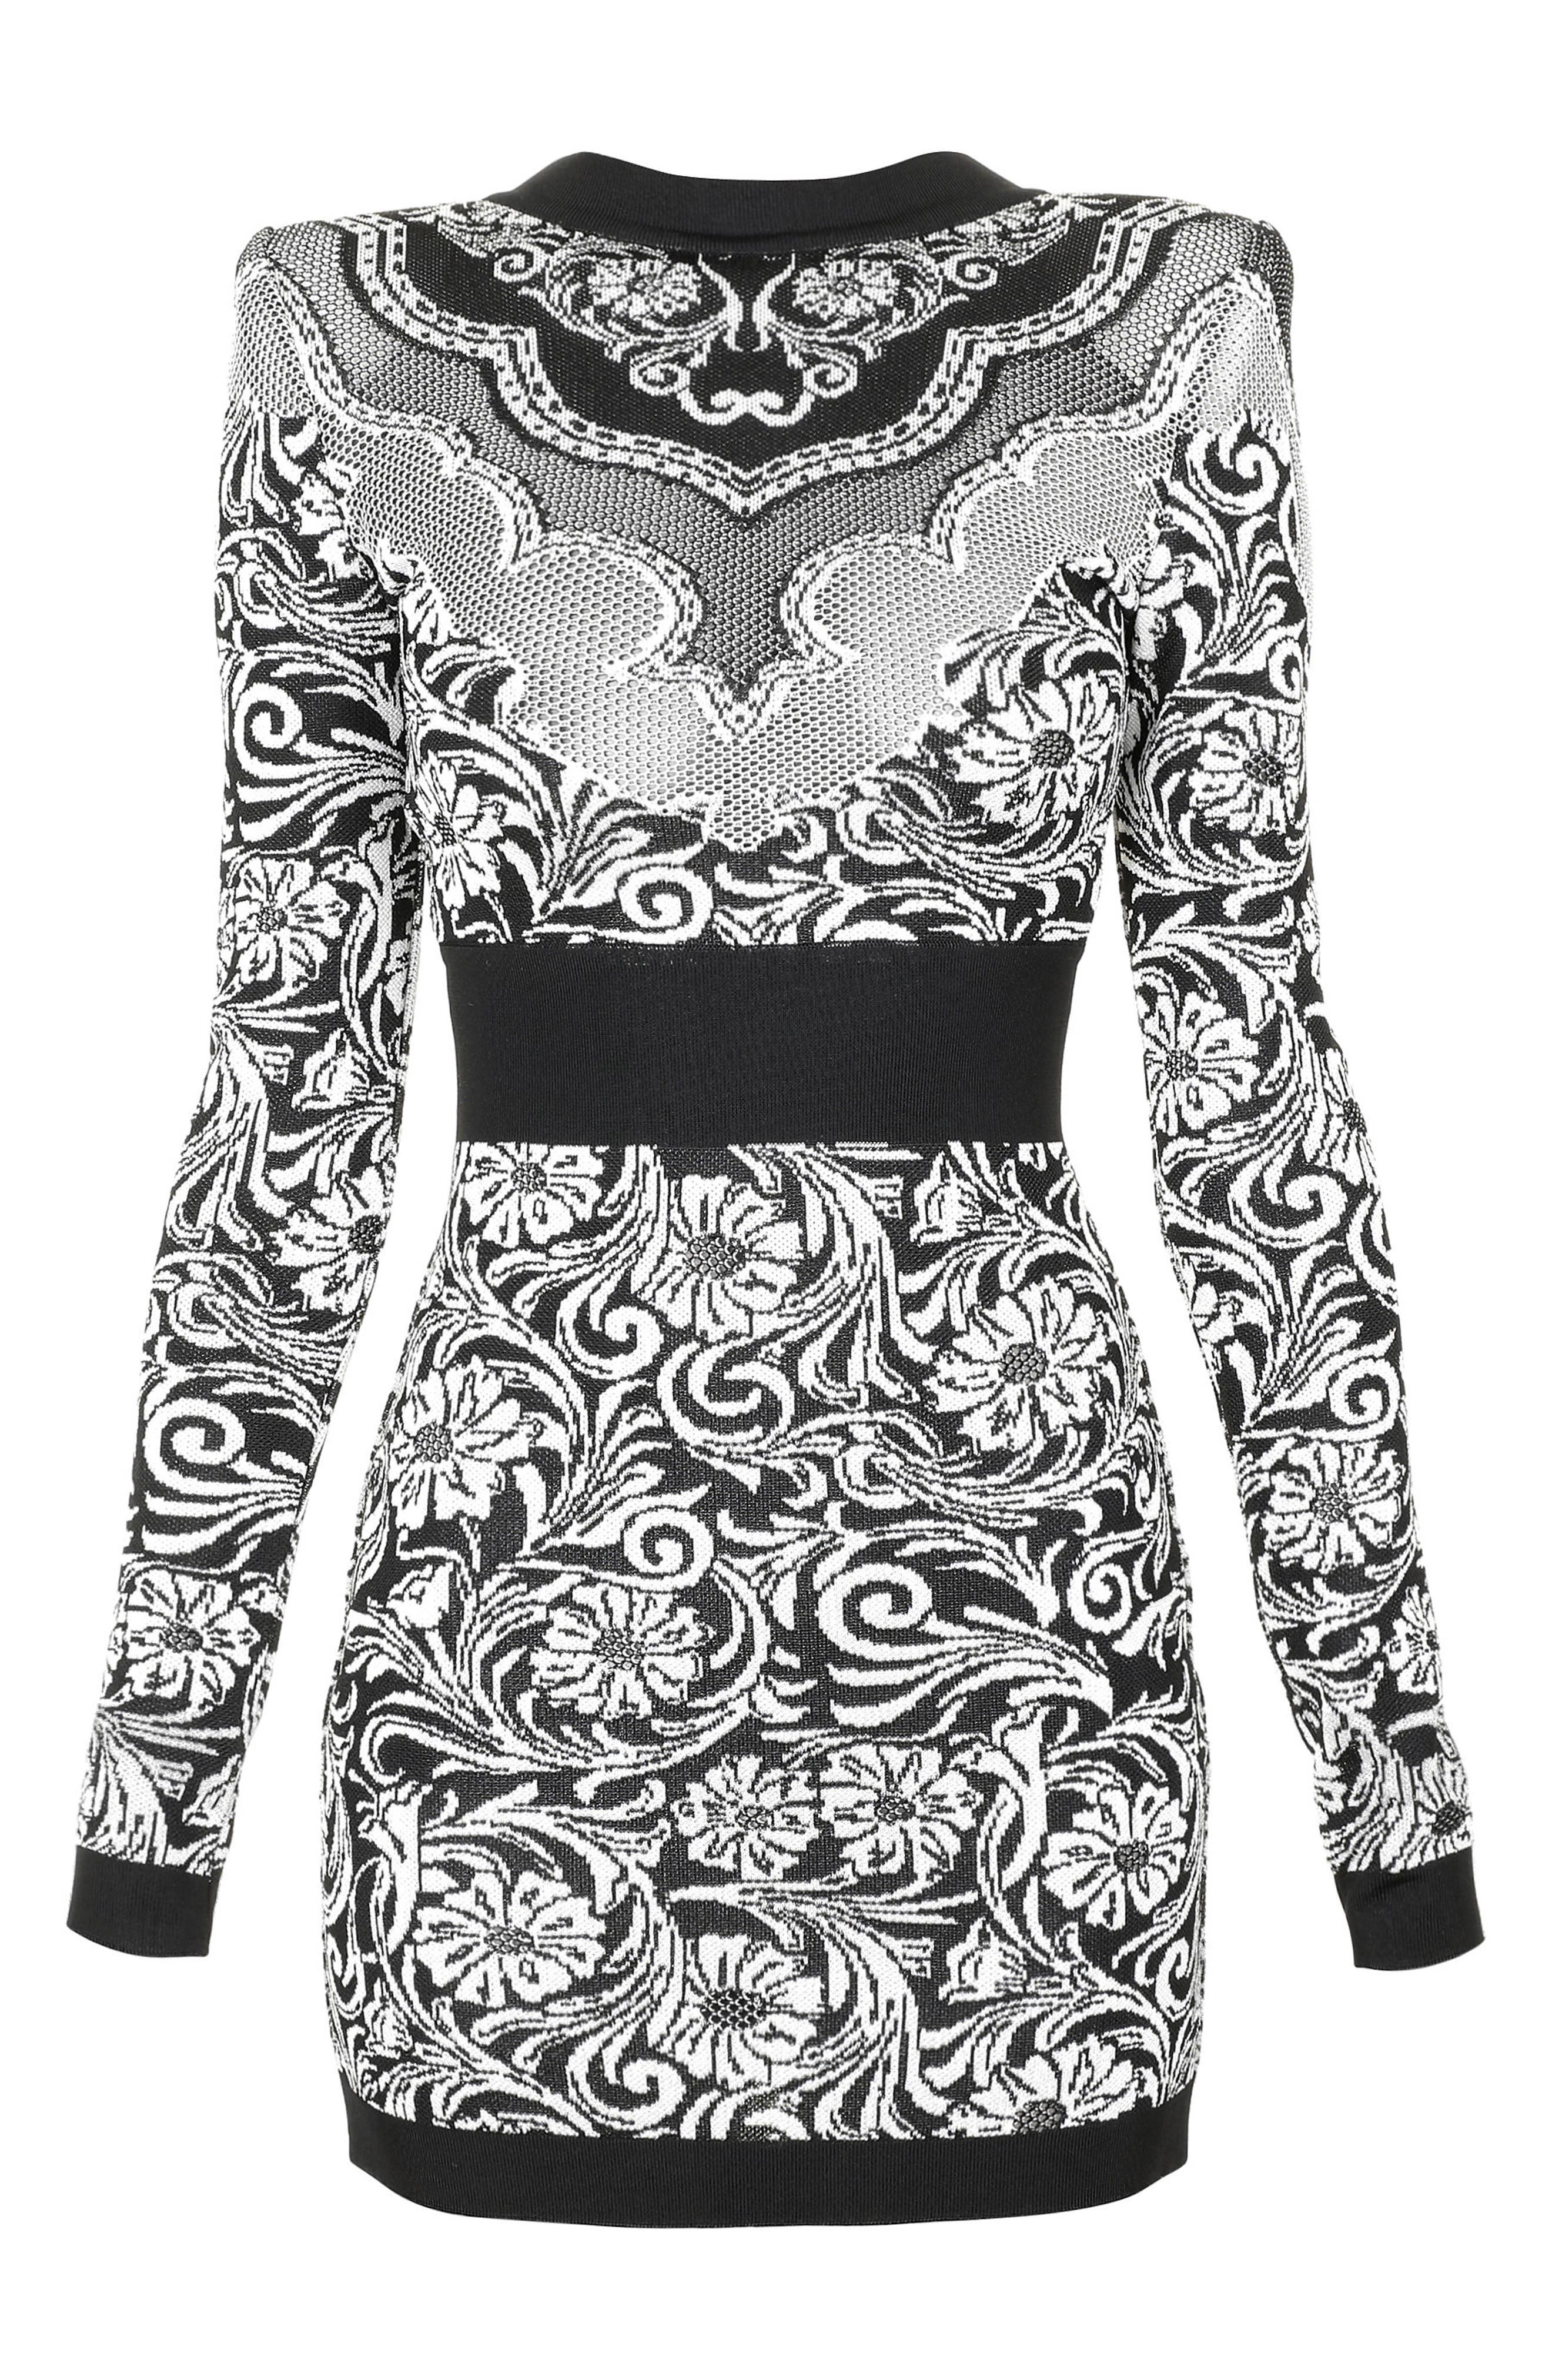 Baroque Knit Minidress,                             Alternate thumbnail 6, color,                             Black And White